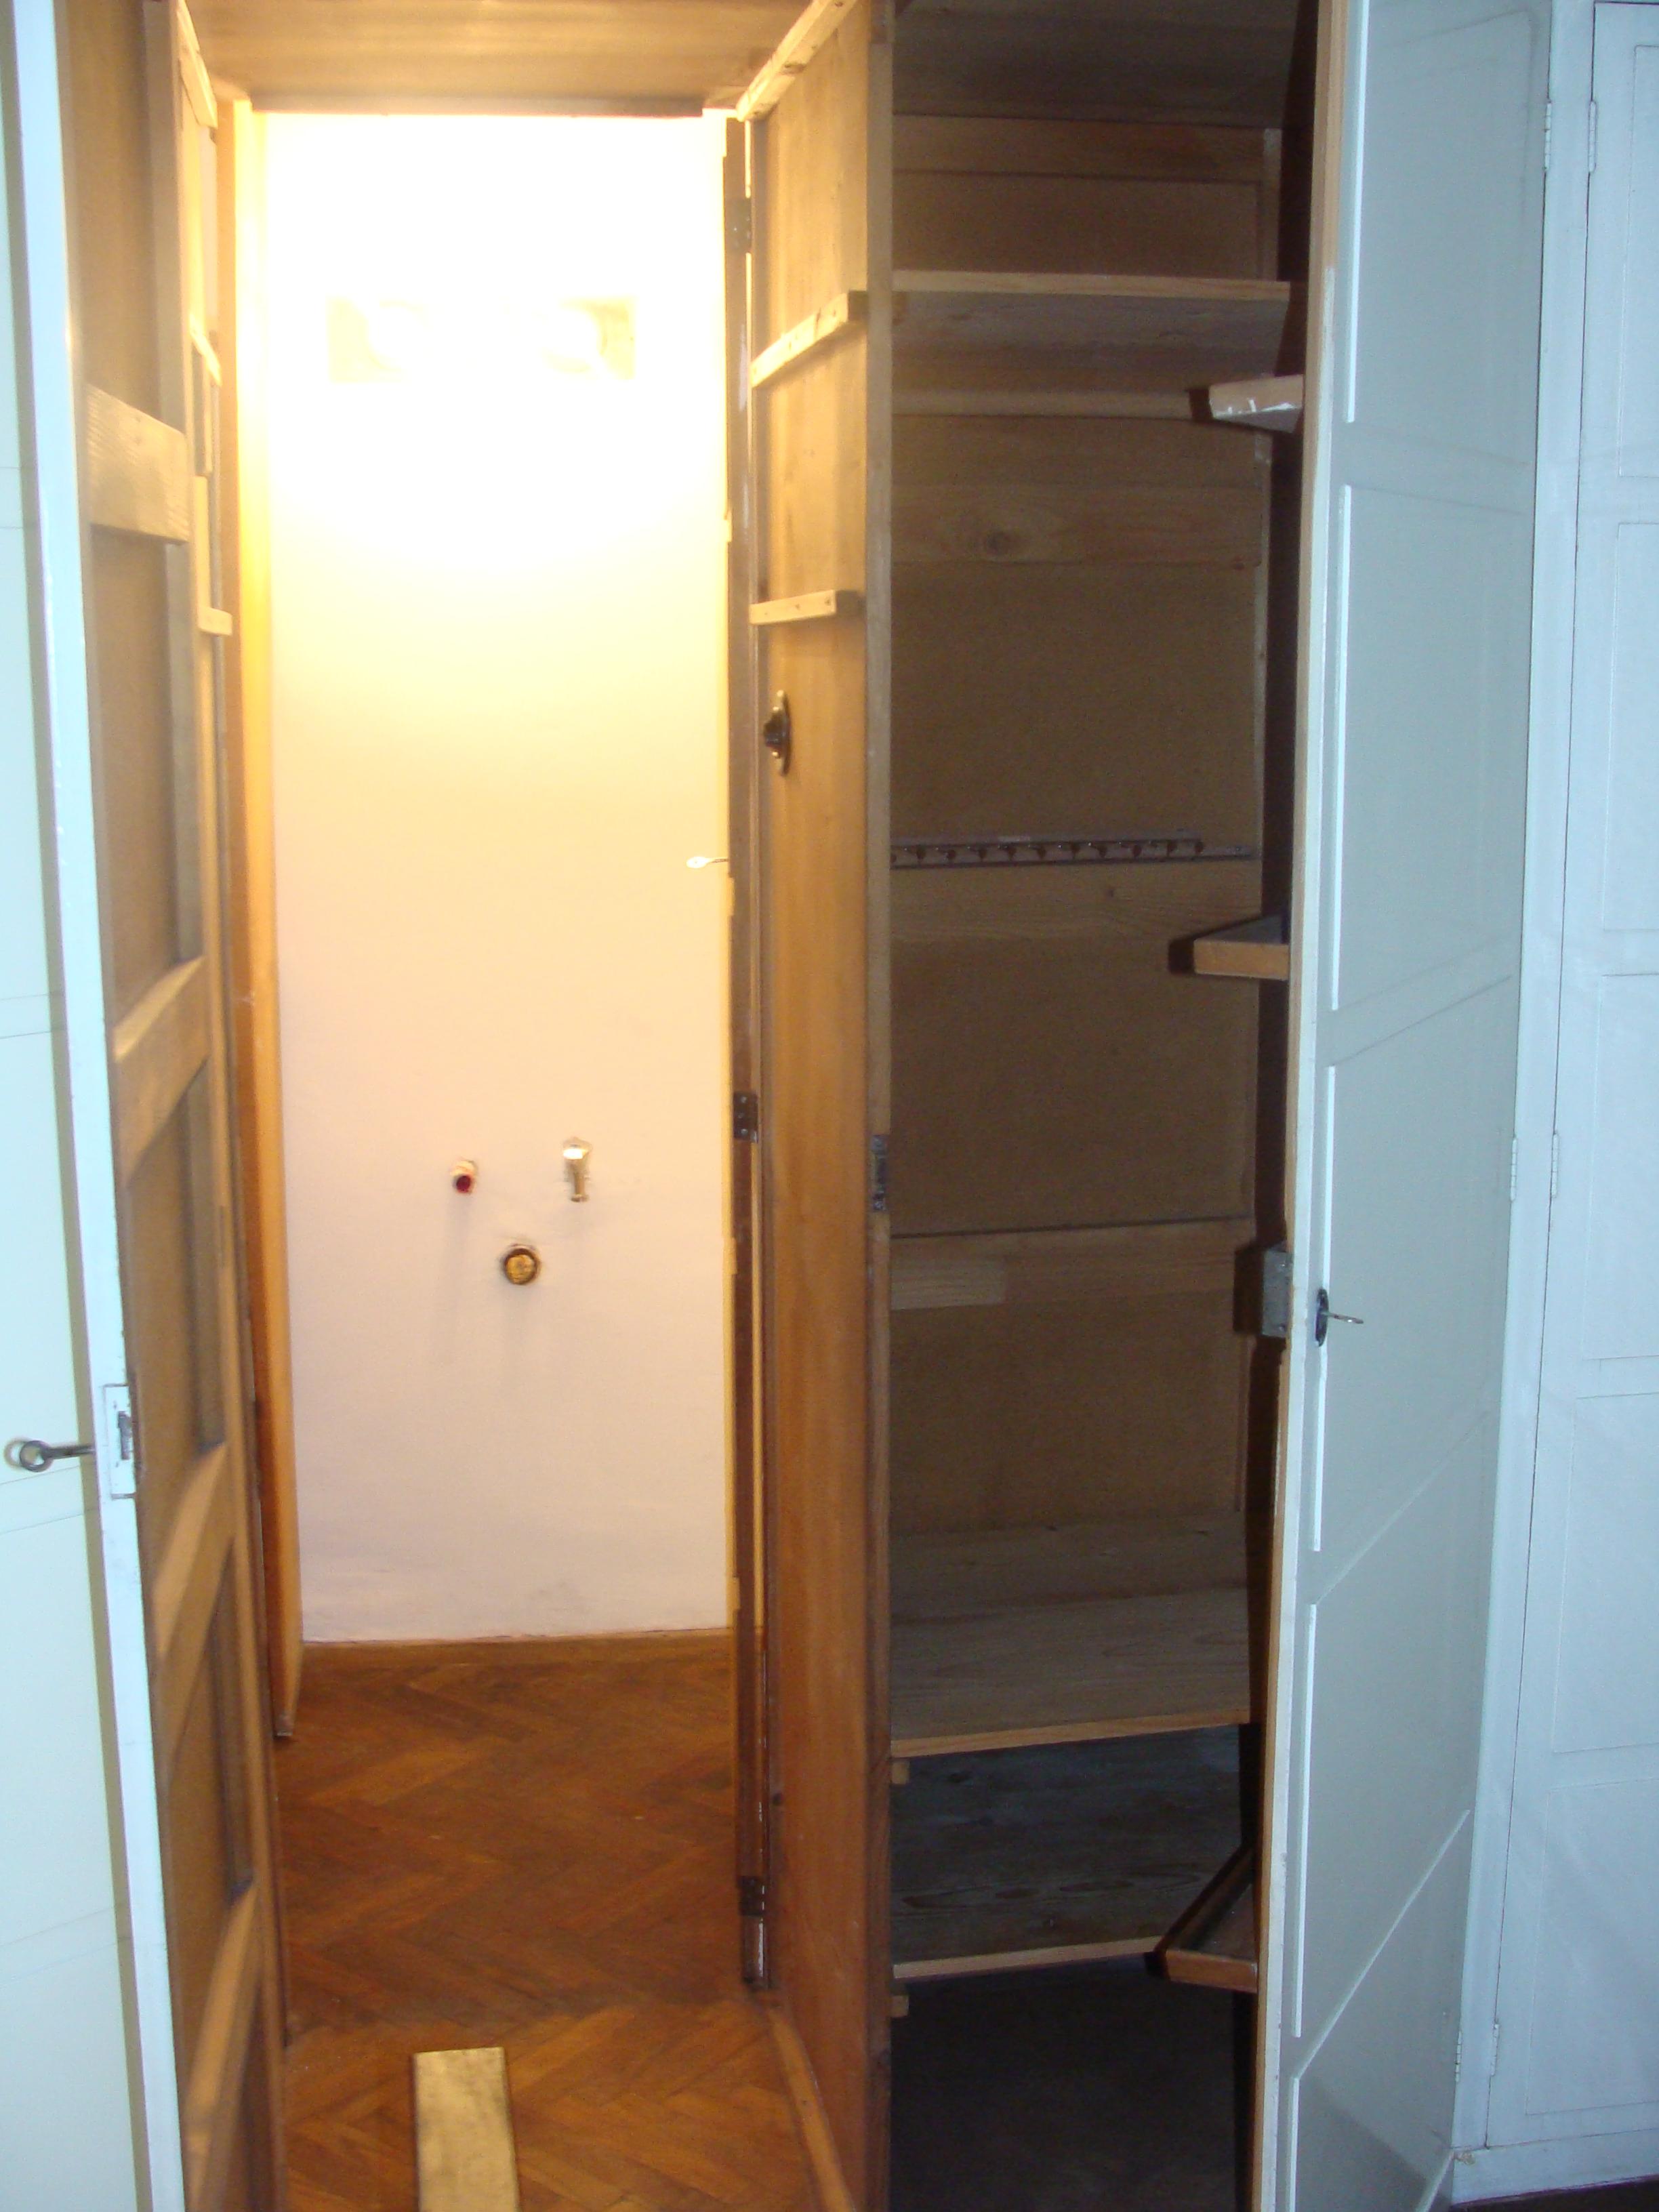 Brennerwohnung 20012010 (56)